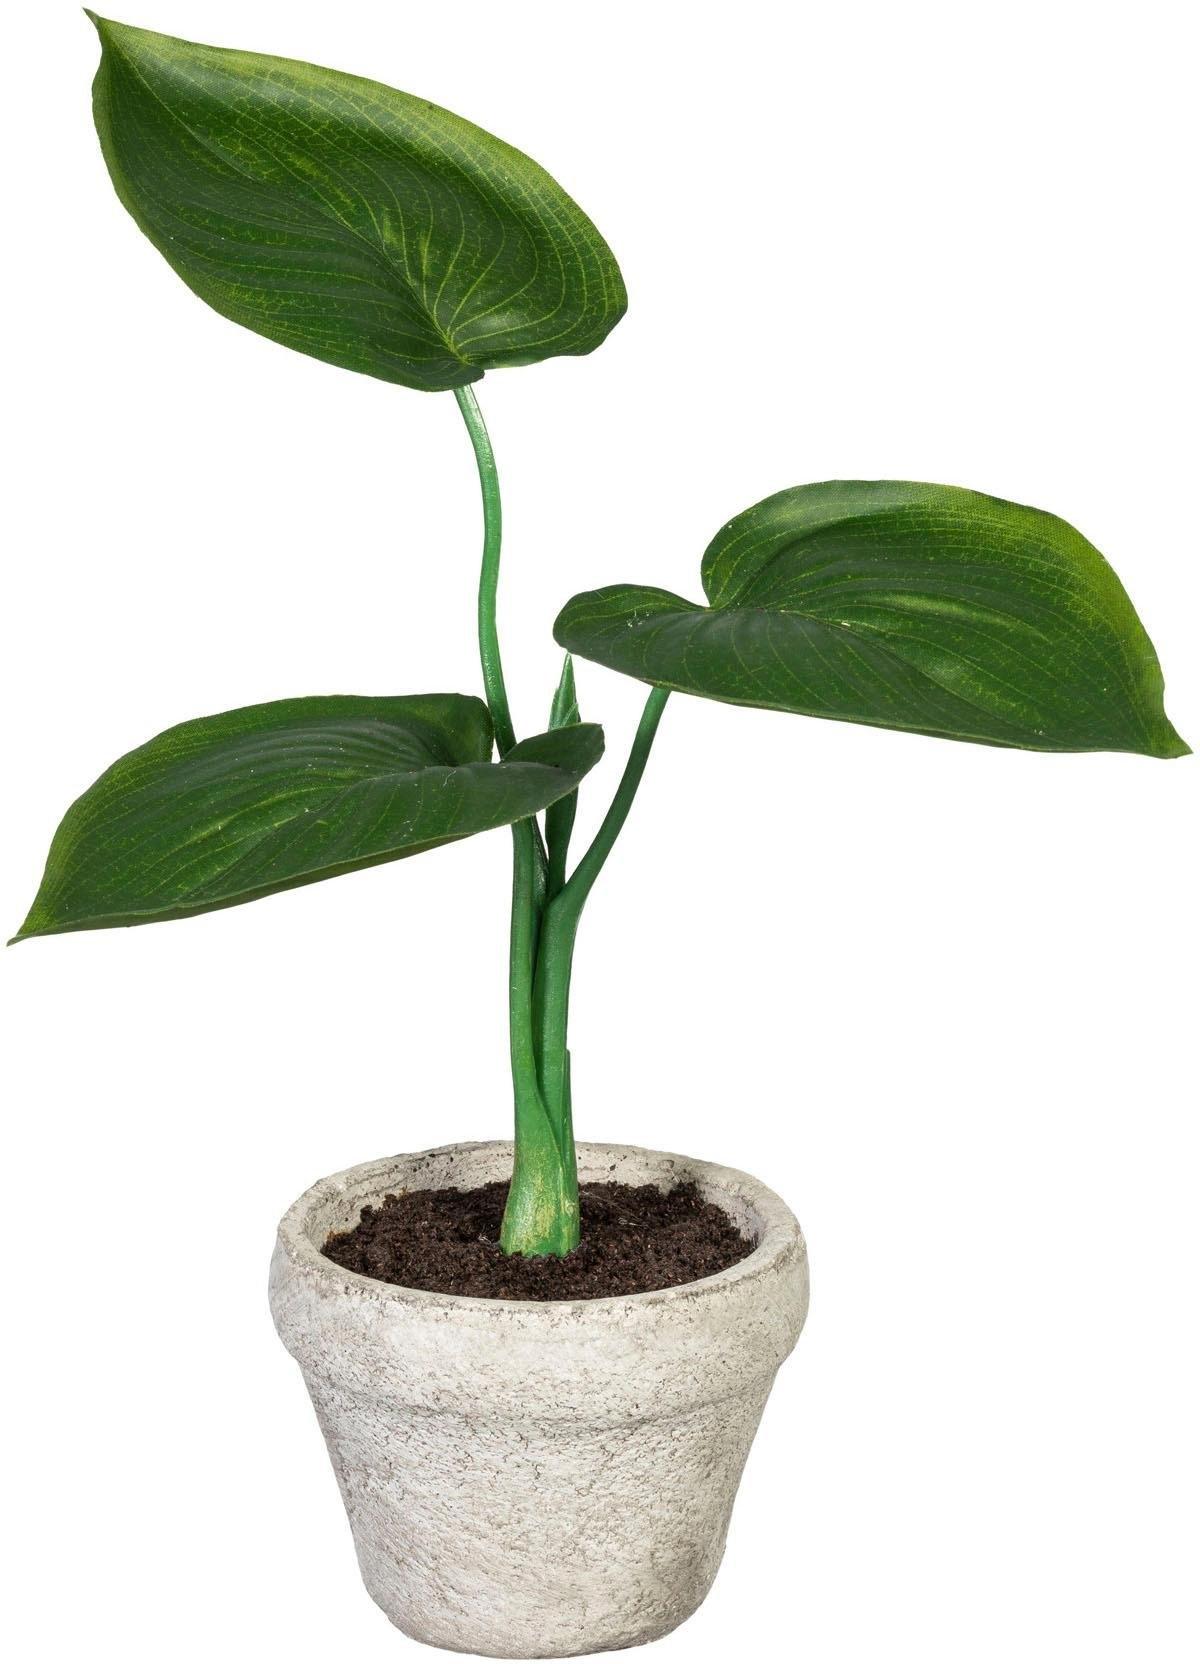 Creativ Green kunst-potplanten »Set aus Grünpflanzen« goedkoop op otto.nl kopen